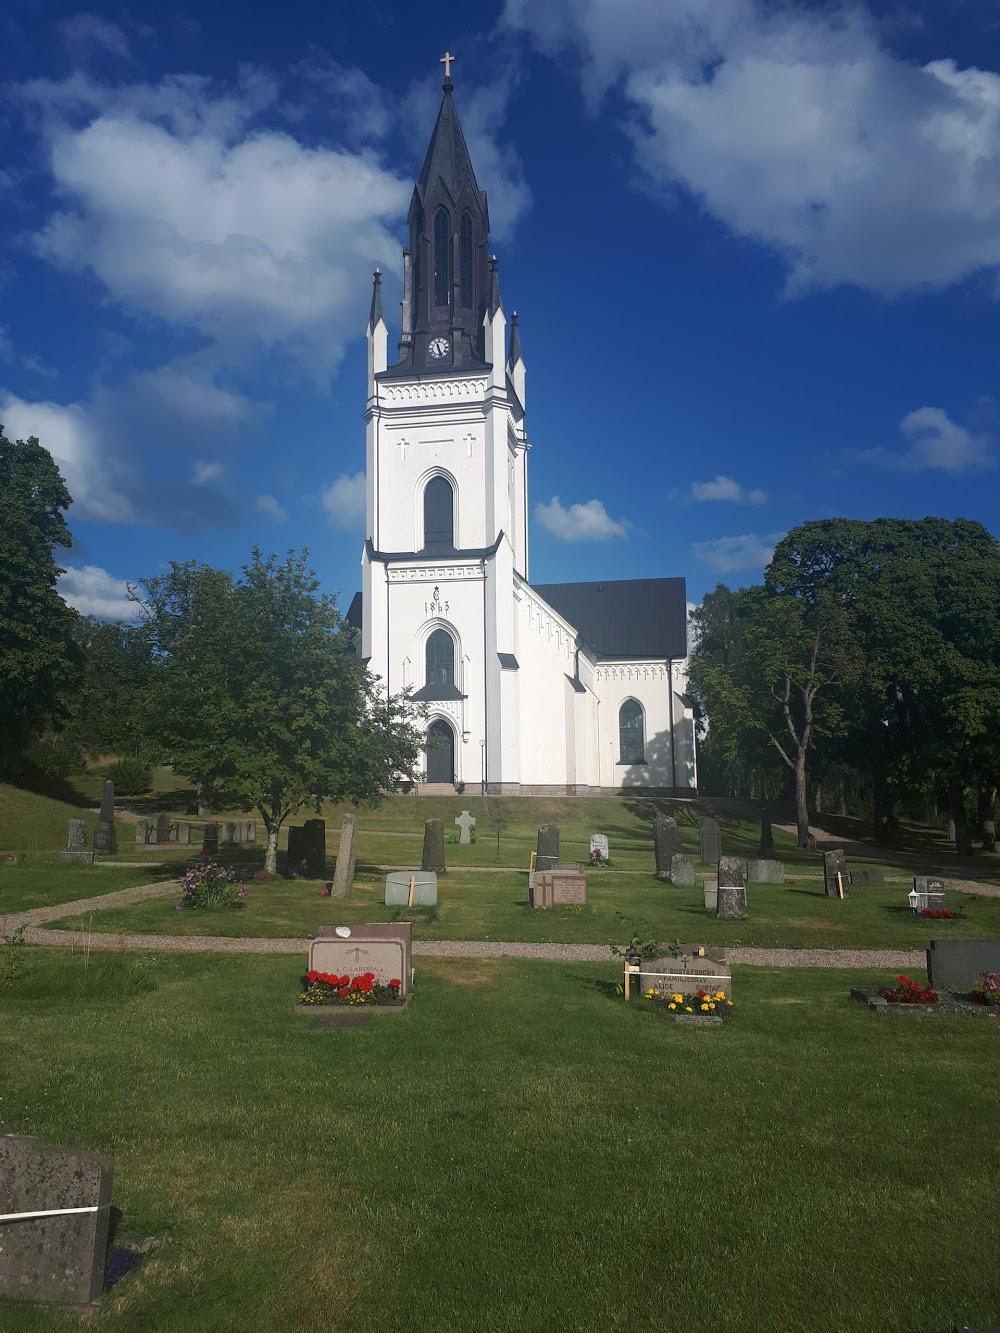 Hed Kyrkogård